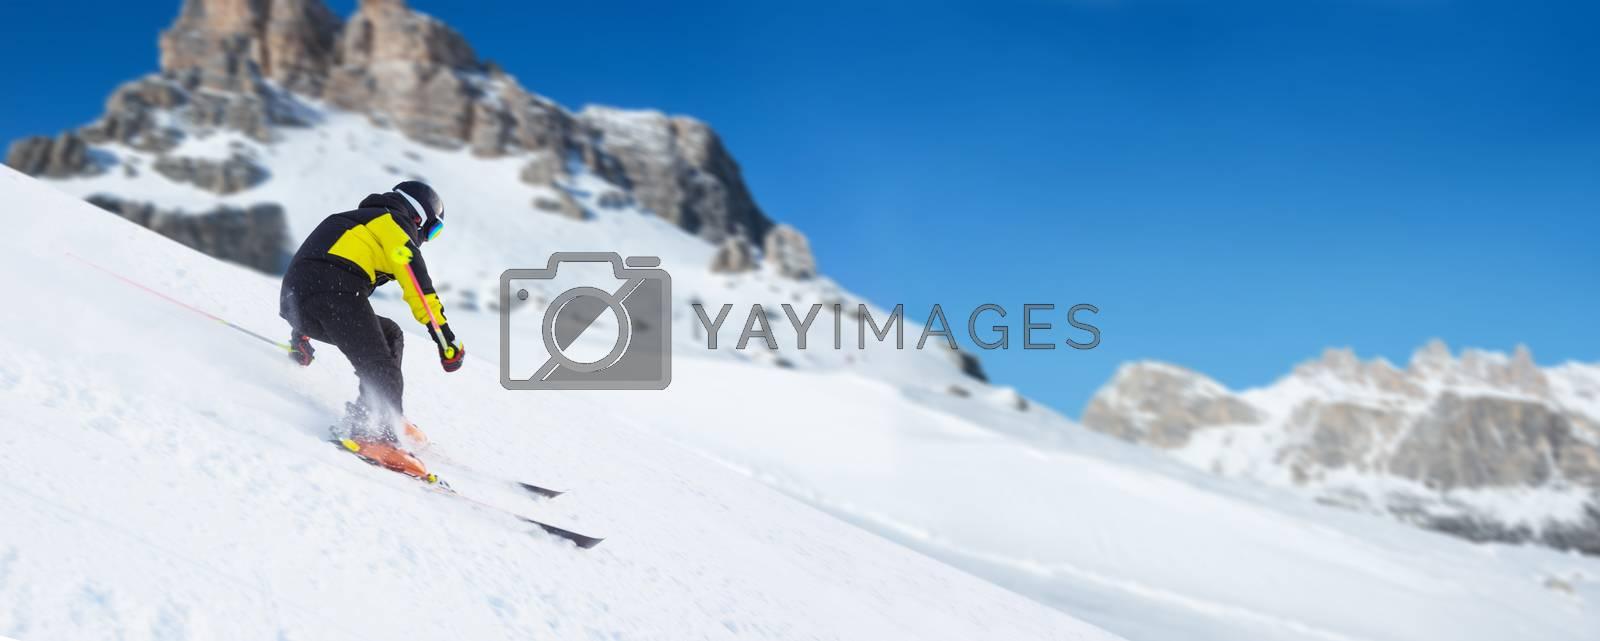 Alpine mountain skier skiing downhill in high mountains Alps Dolomites region of Northern Italy ski resort piste